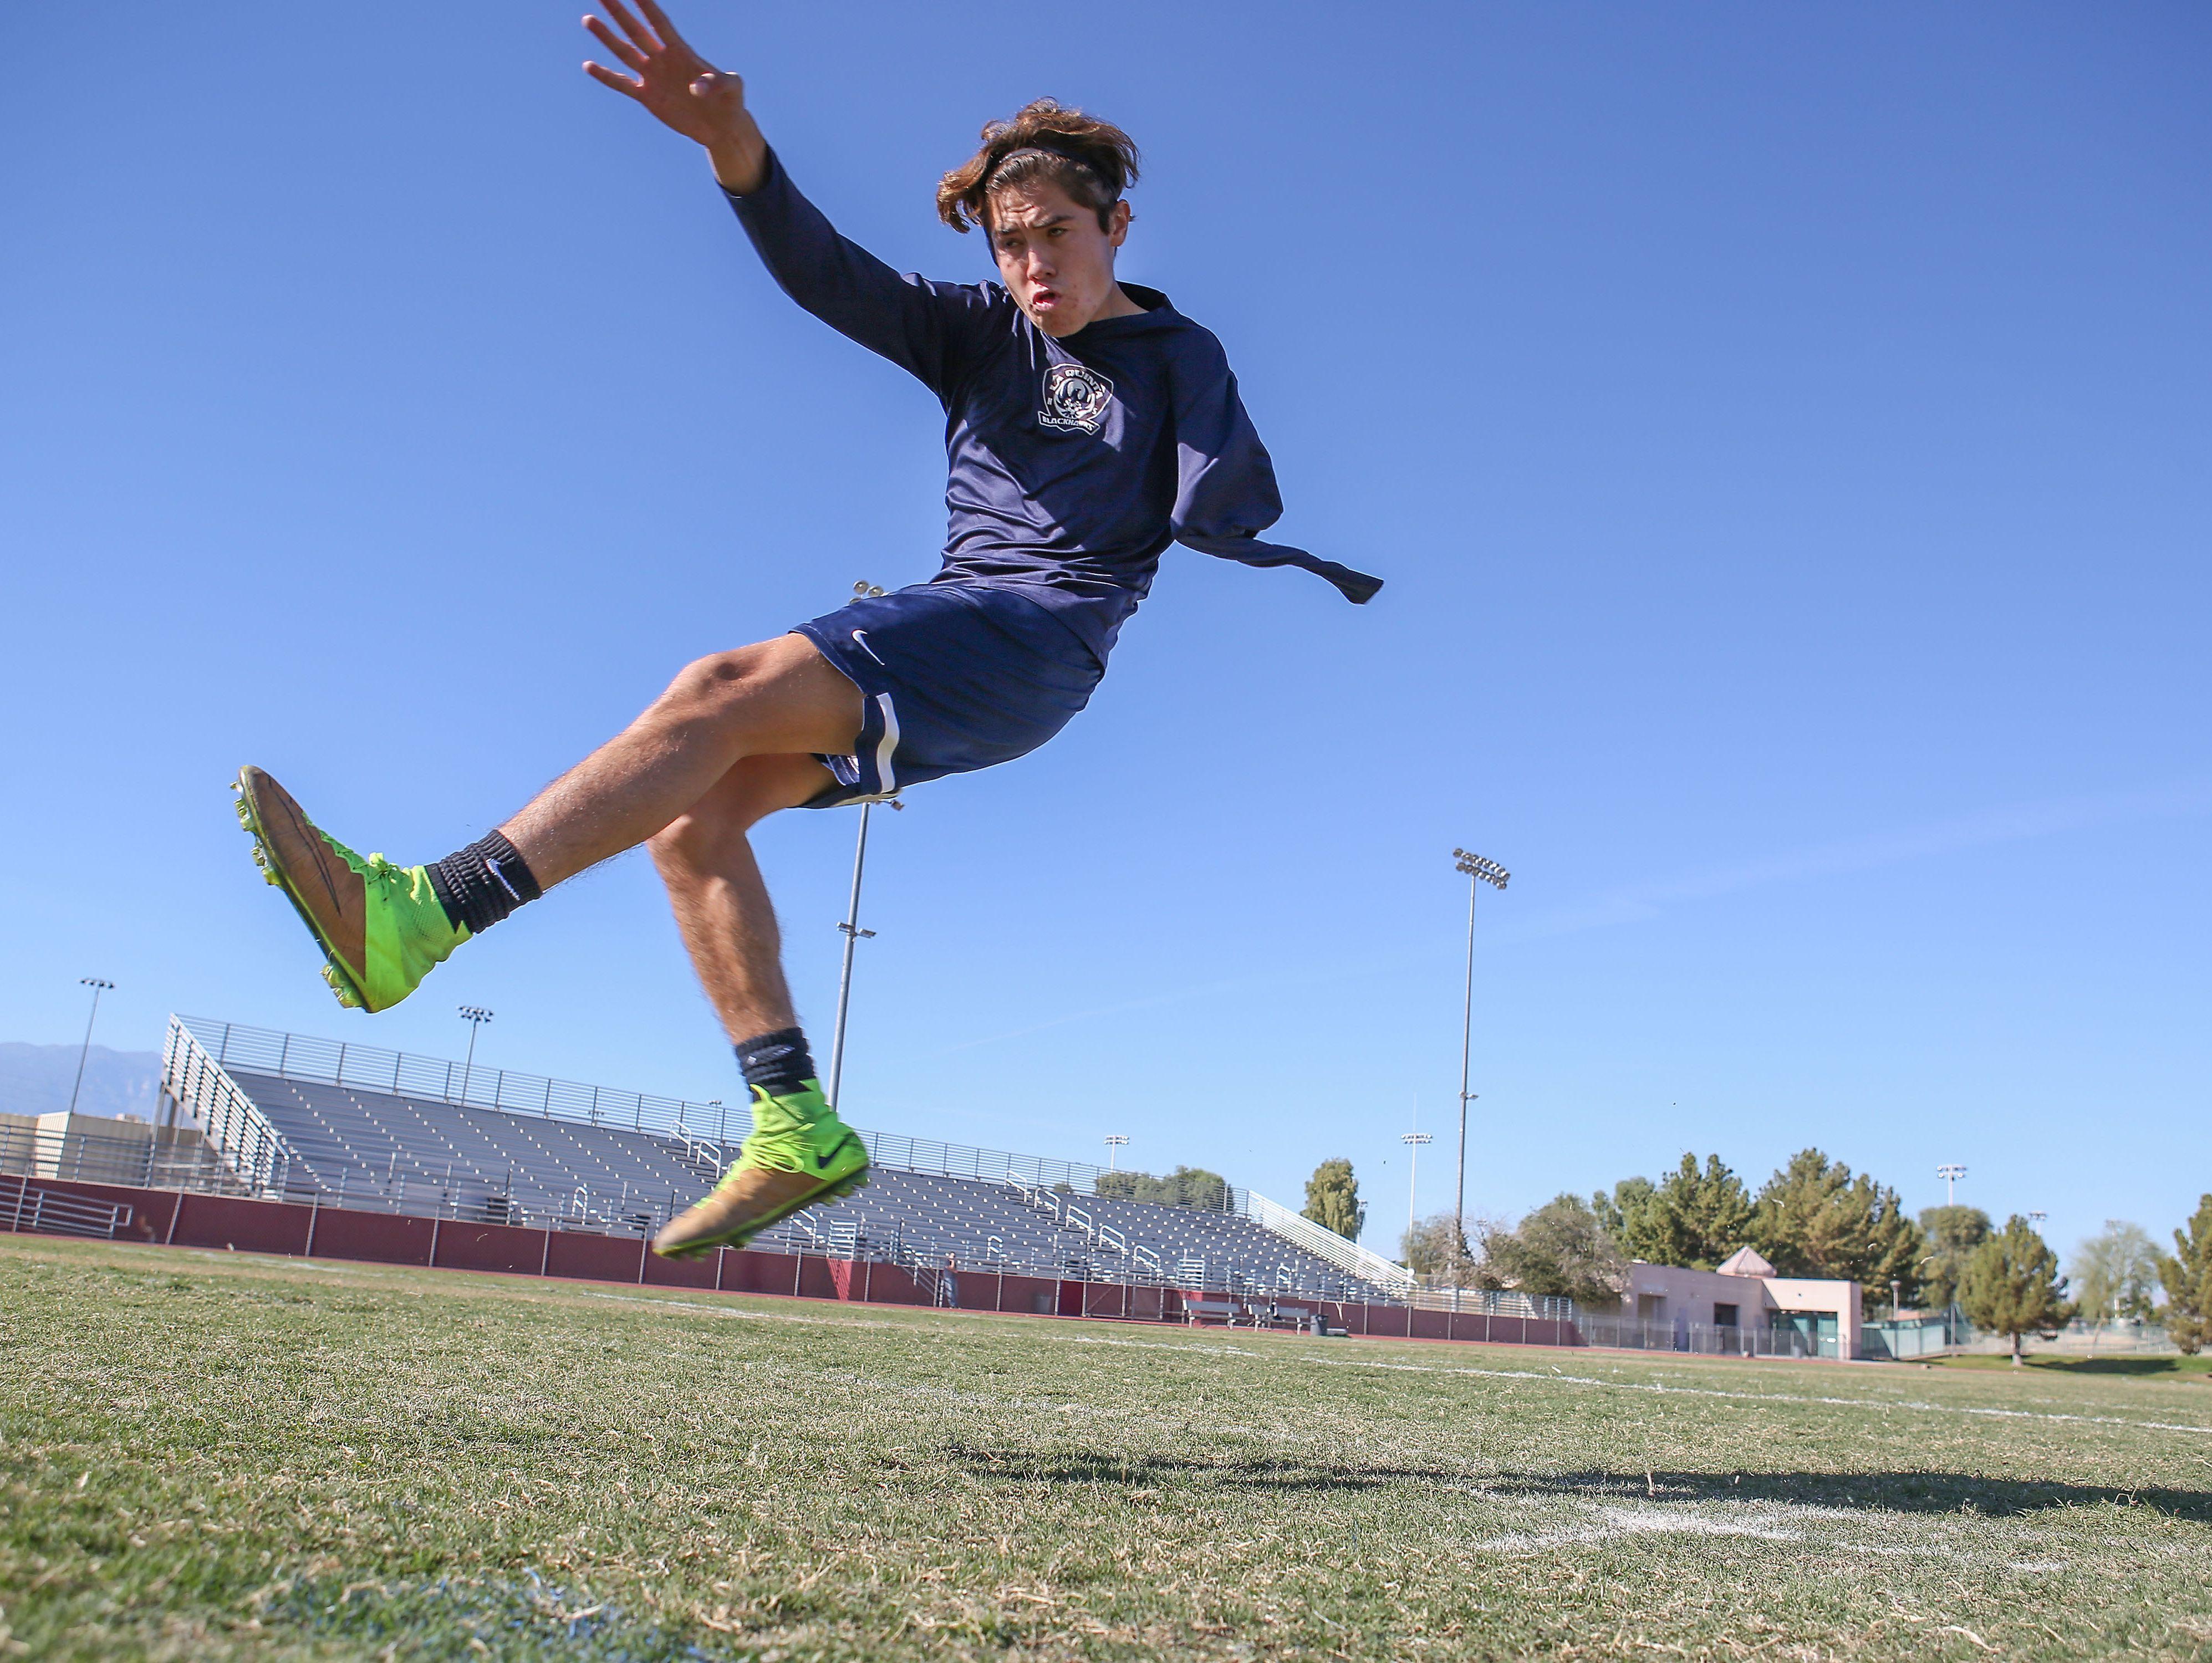 Lucas Rosales, a senior soccer player at La Quinta High School, follows through on a shot while practicing, November 22, 2016.